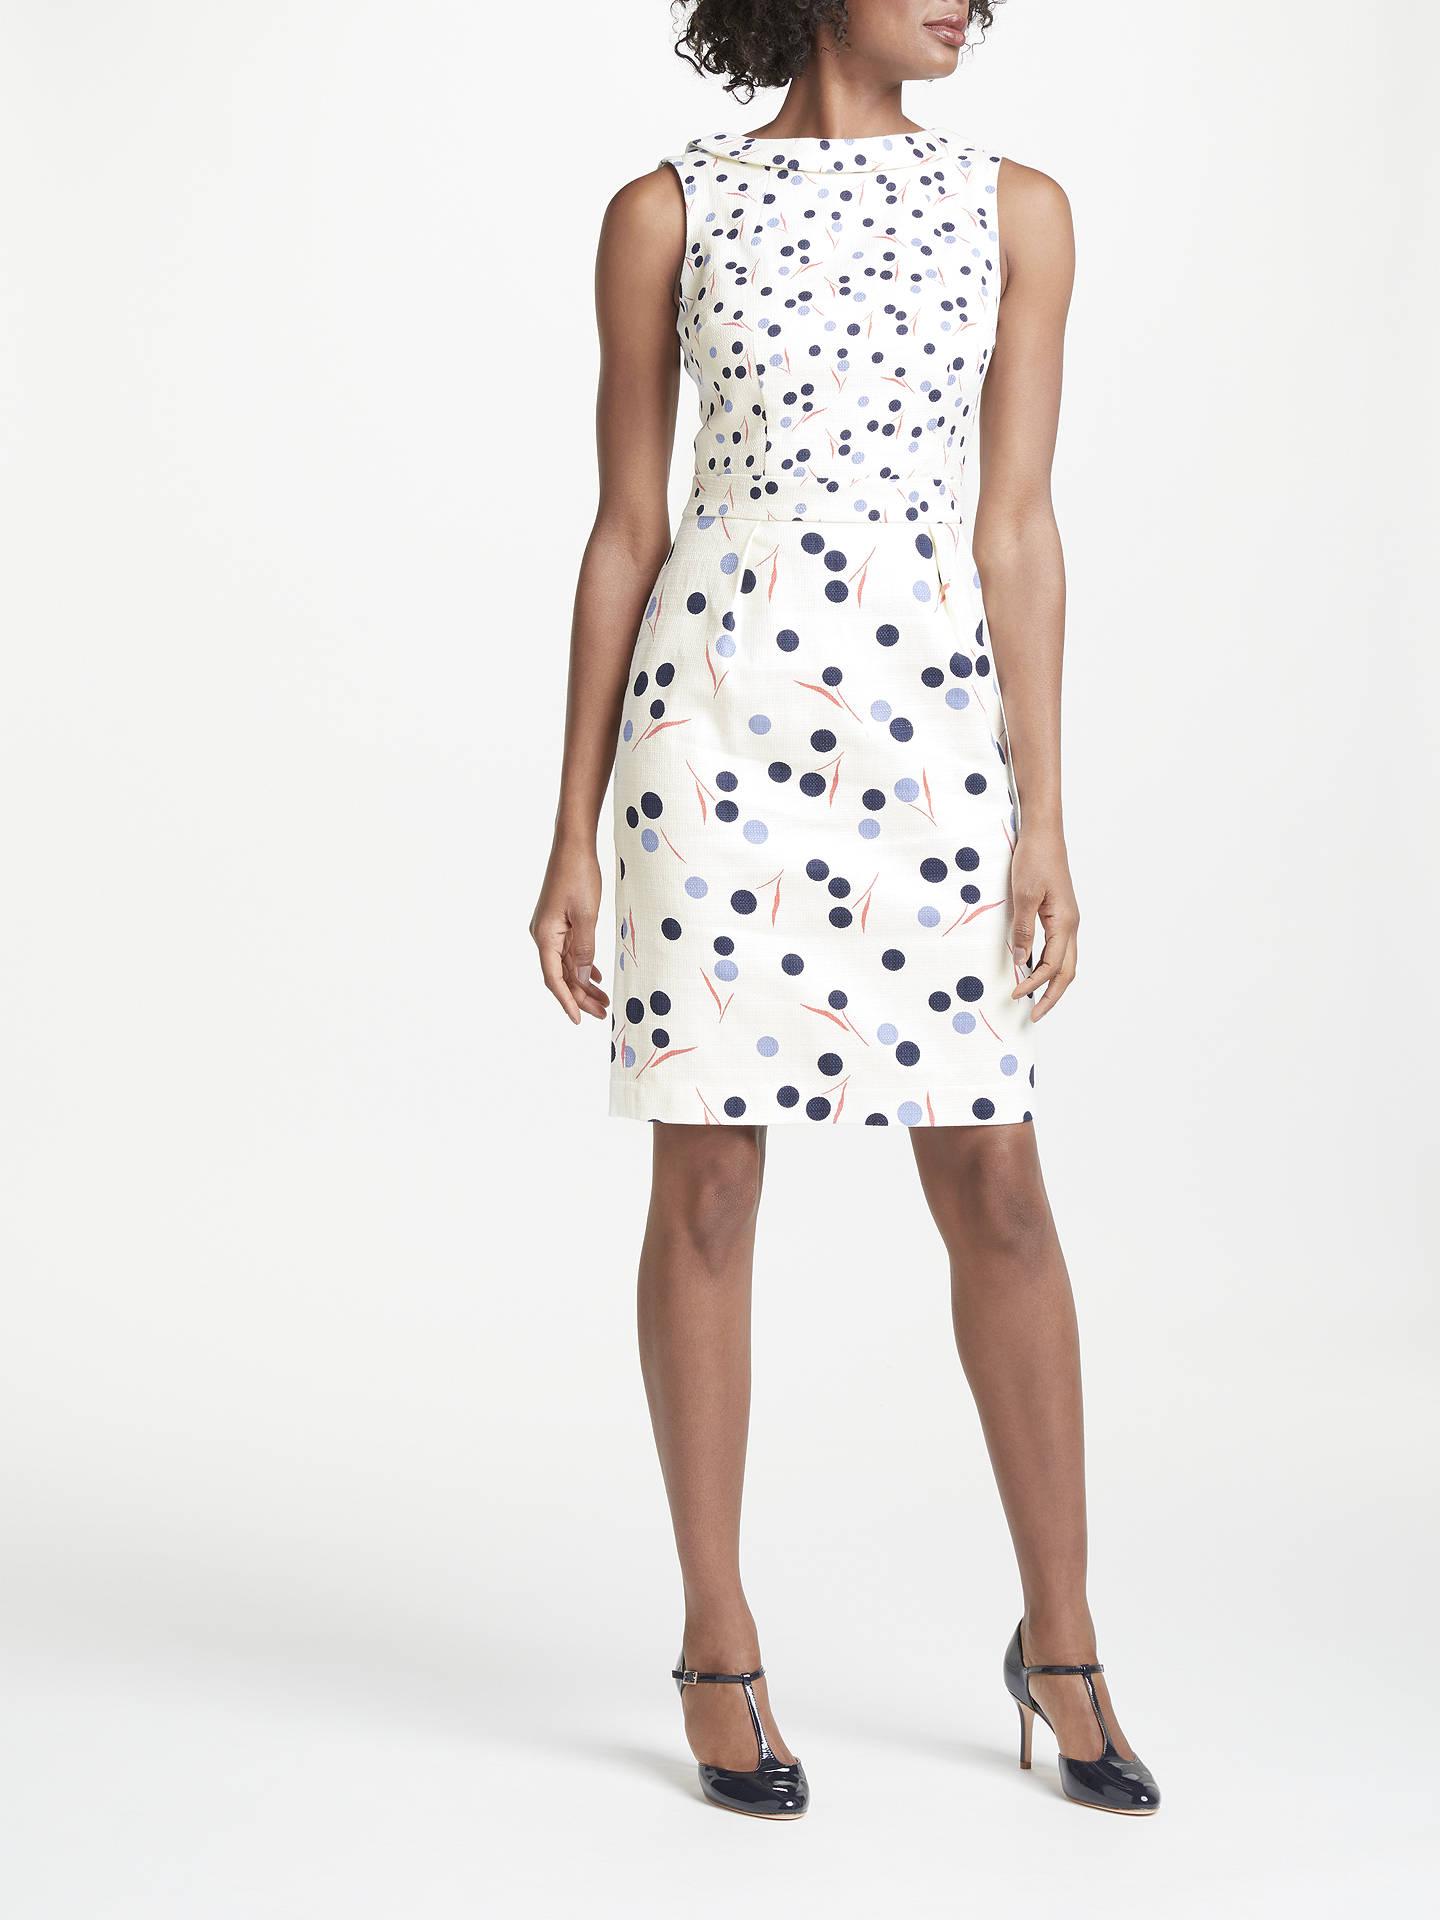 99edf82492 ... Buy Boden Martha Sleeveless Dandelion Print Dress